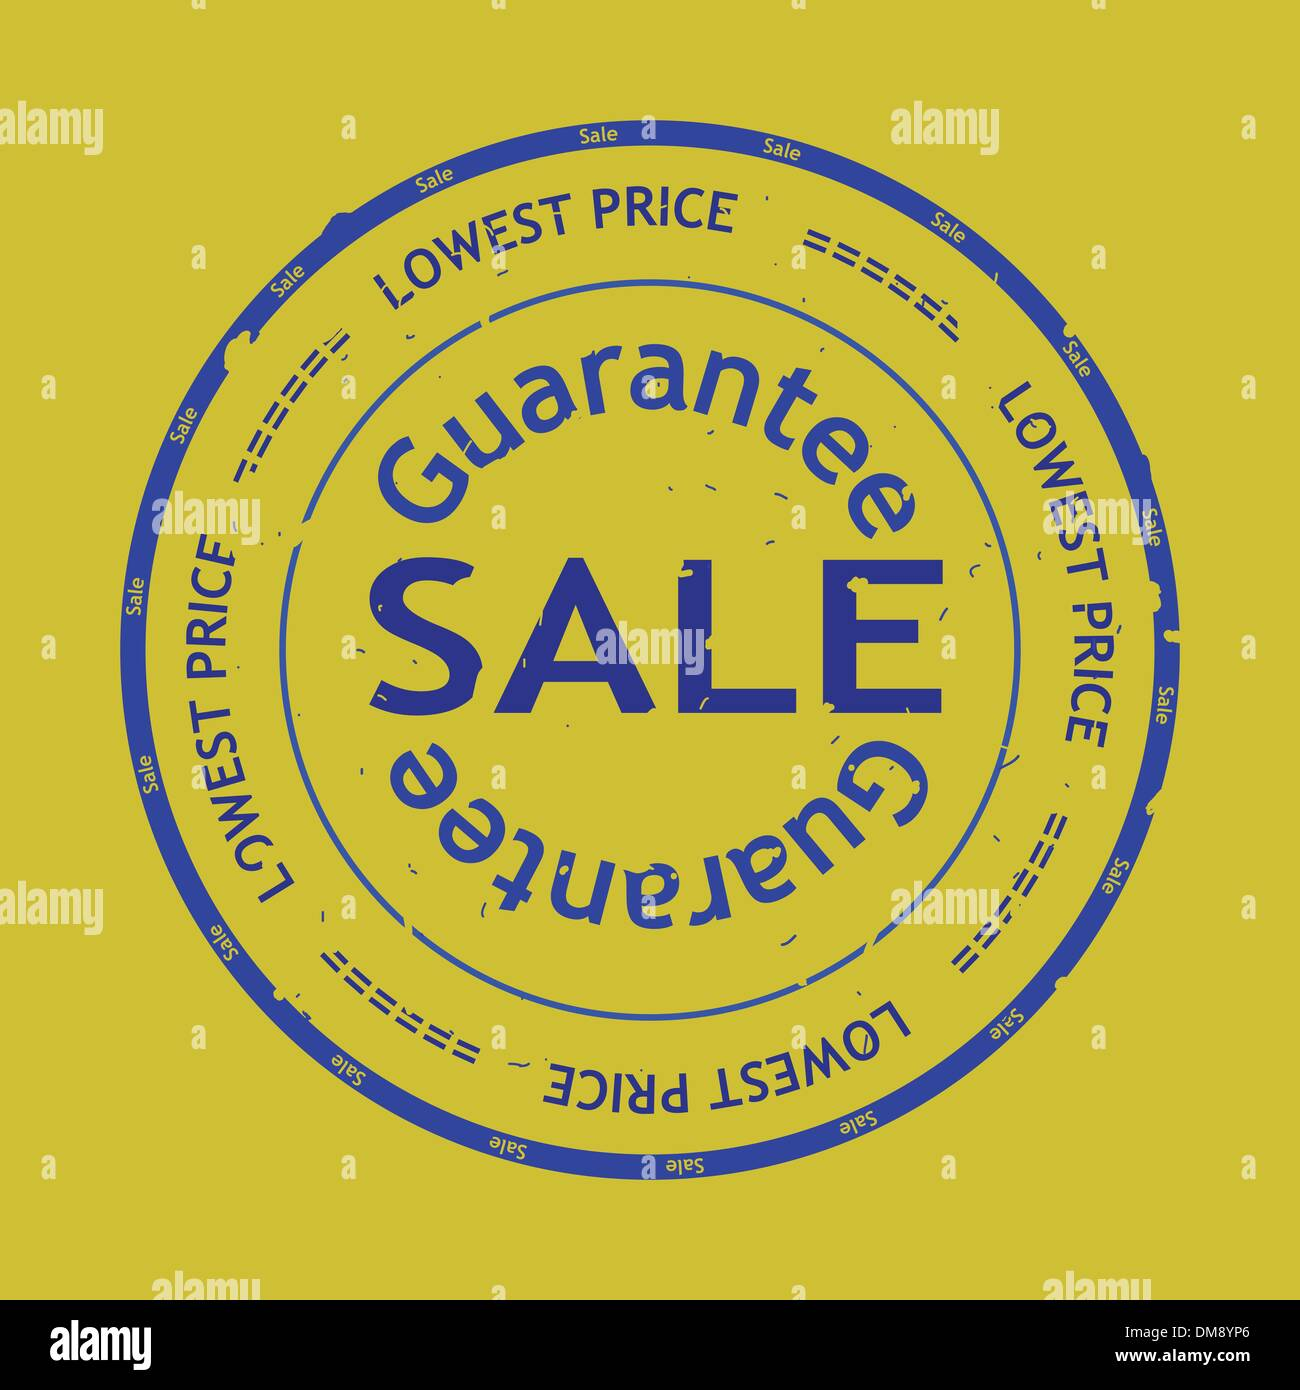 Vector Sale Grunge Rubber Stamp Stock Vector Art Illustration